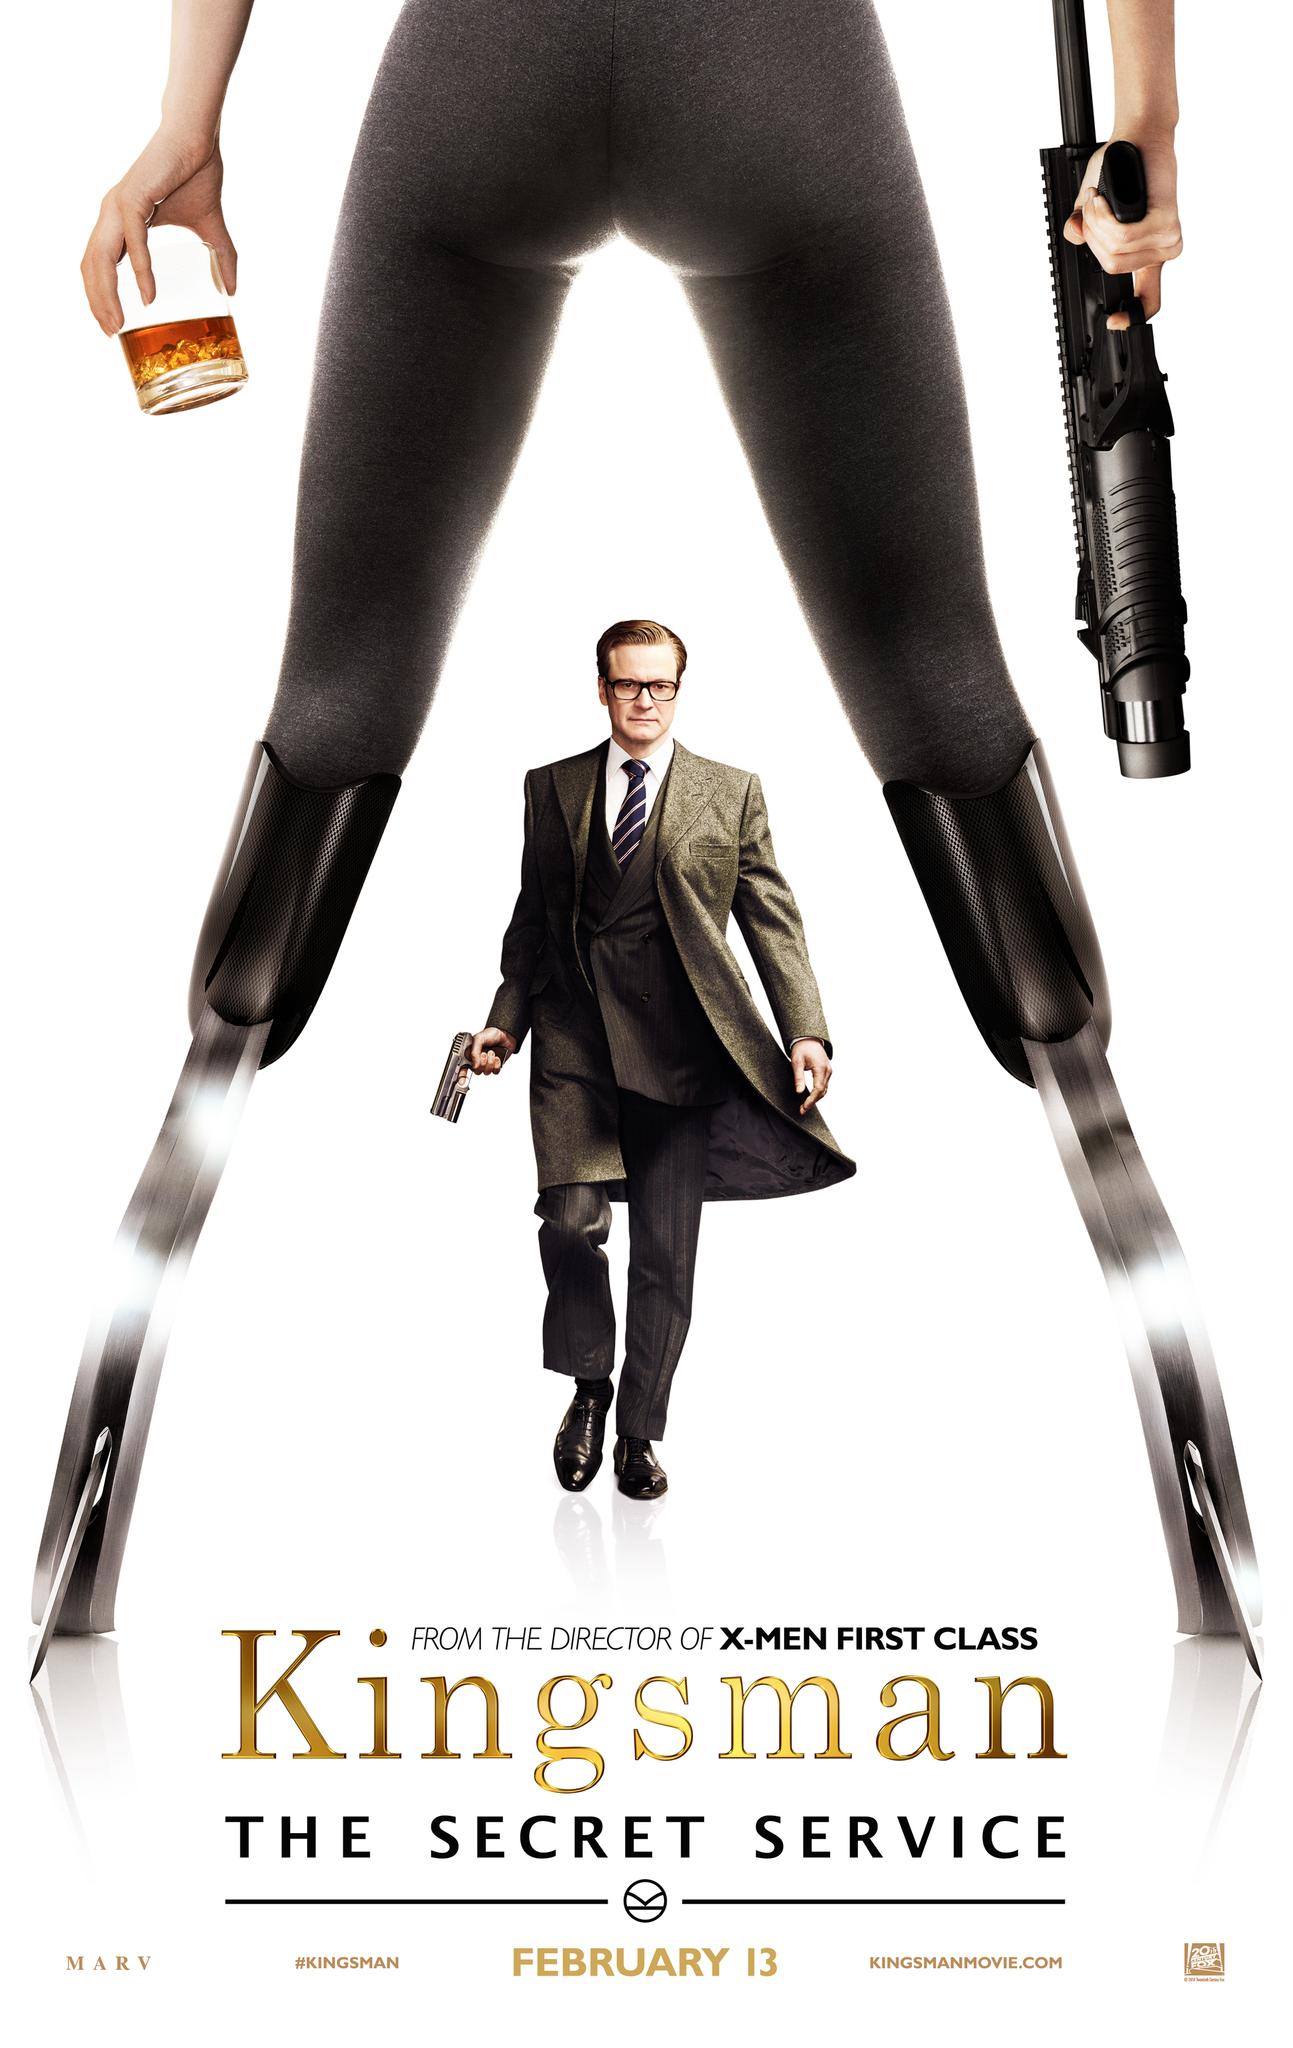 Colin Firth and Sofia Boutella in Kingsman: The Secret Service (2014)